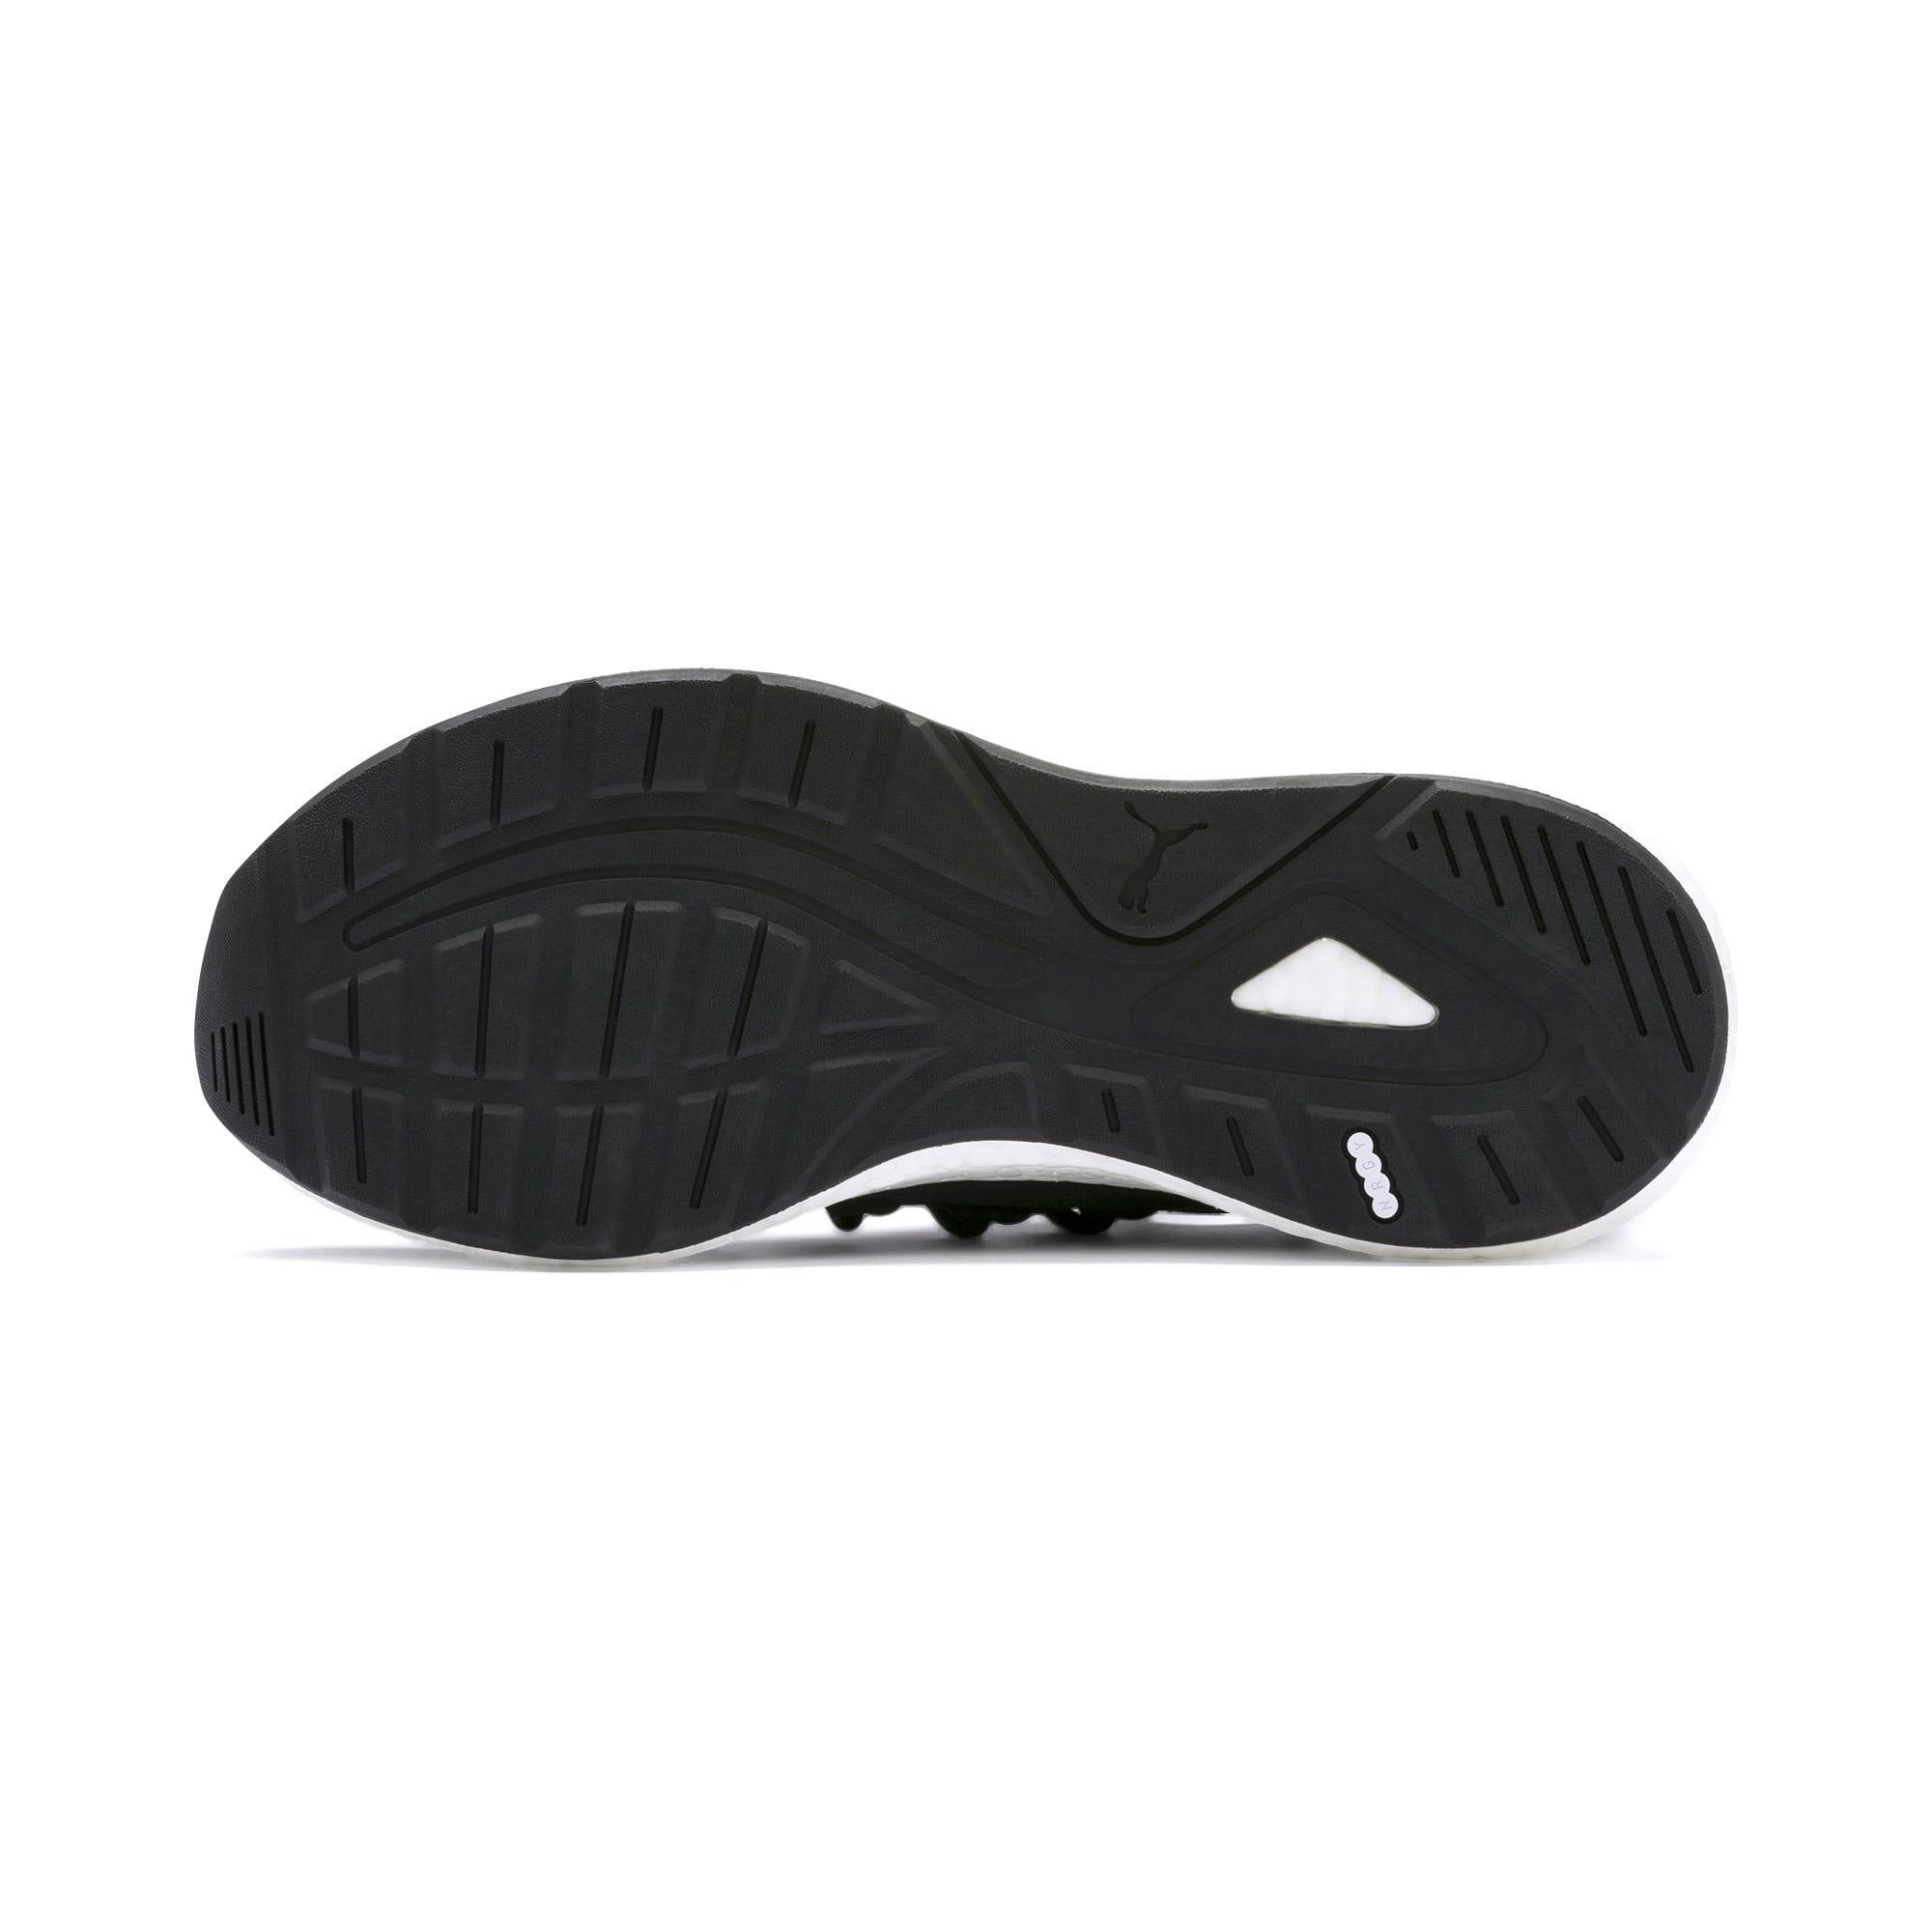 Thumbnail 5 of NRGY Neko Knit Women's Running Shoes, Puma Black-Bridal Rose, medium